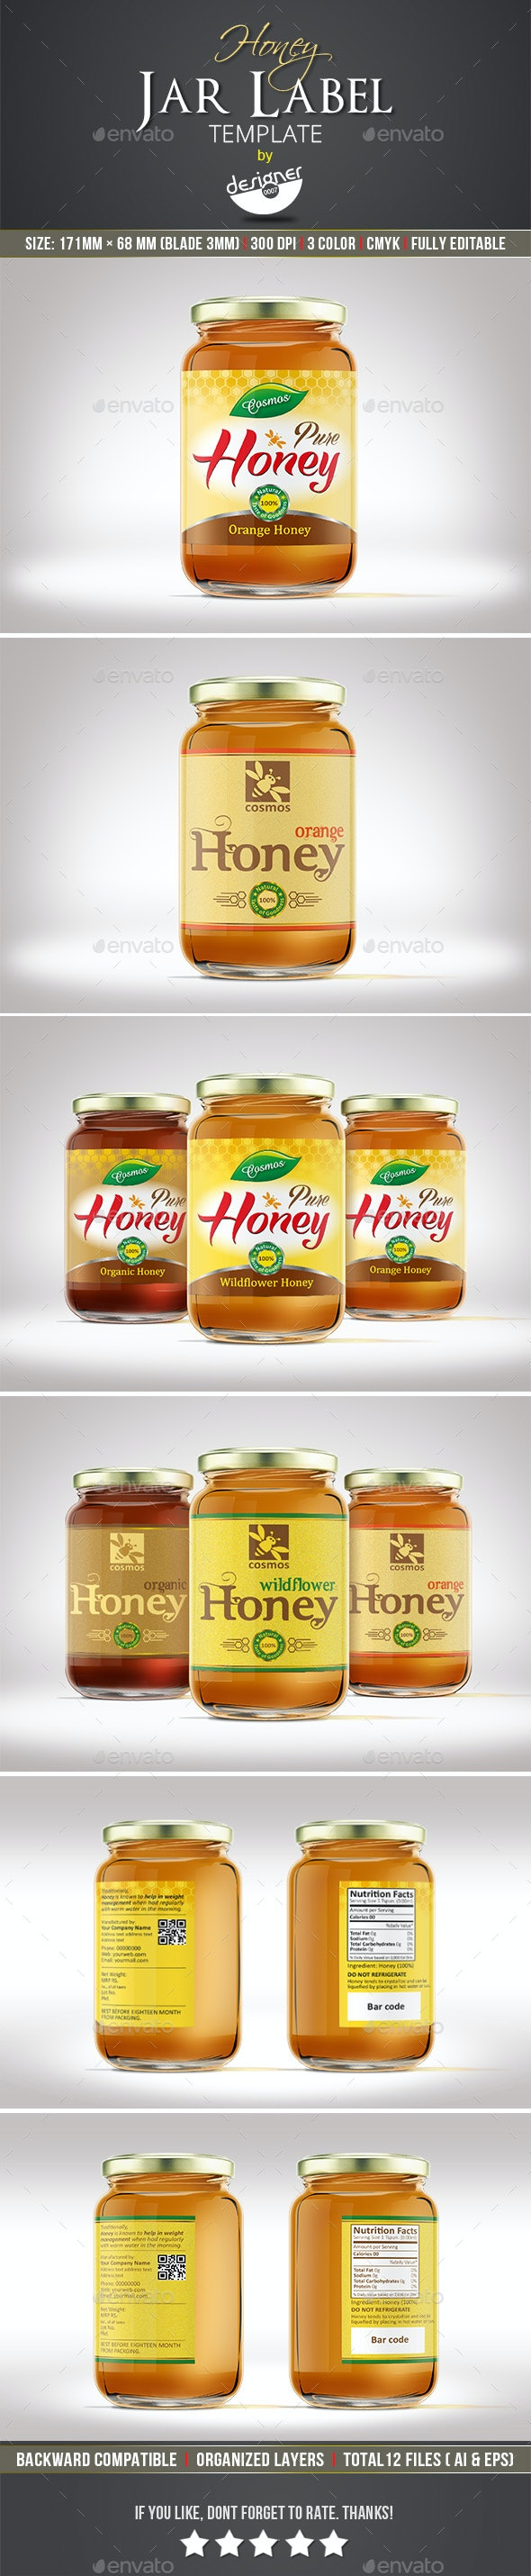 Honey Jar Label Template - Packaging Print Templates